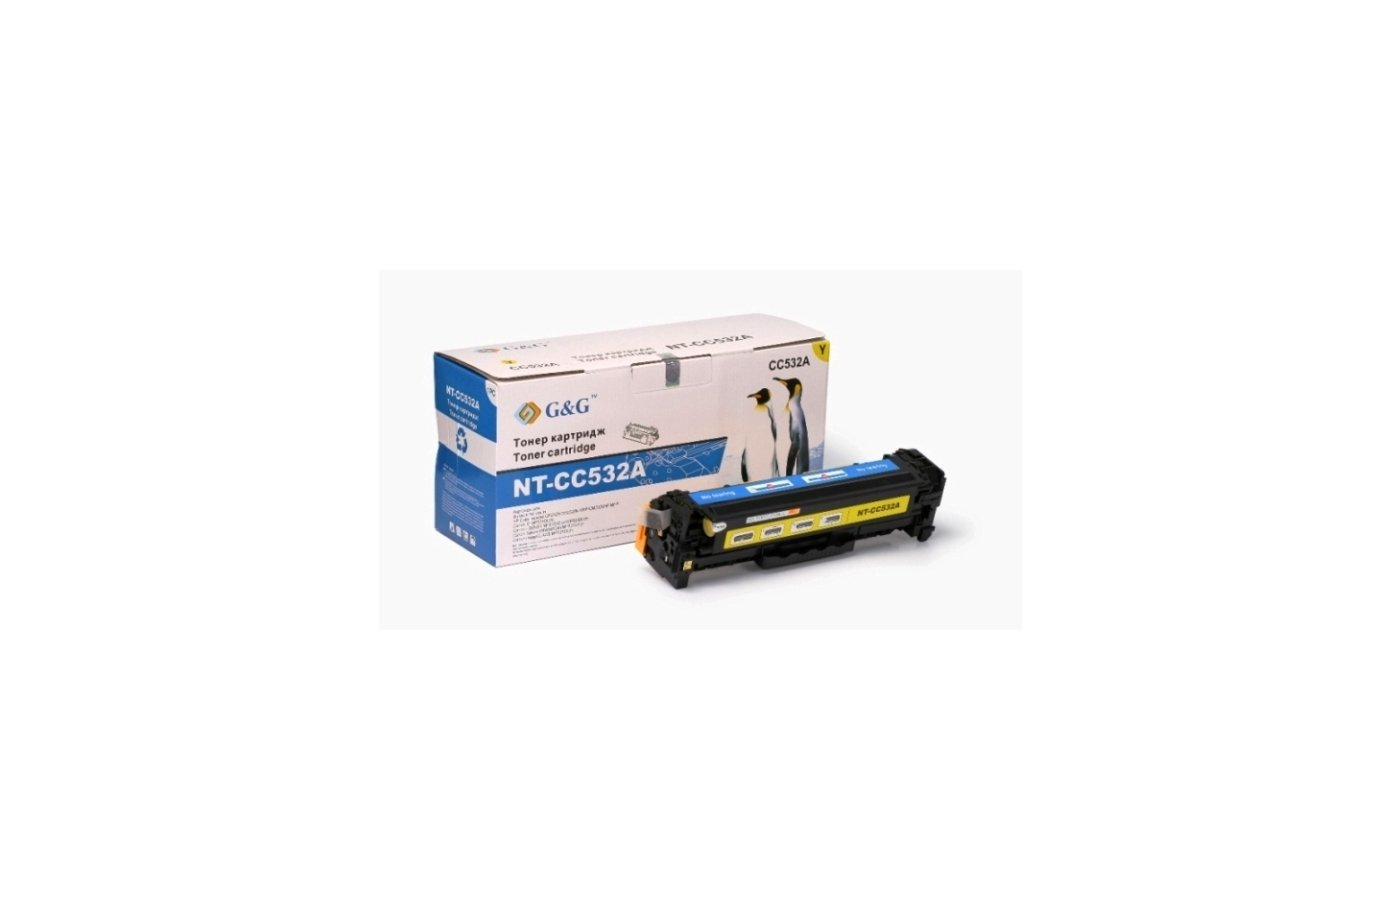 Картридж лазерный GG NT-CC532A Совместимый желтый для HP Color LaserJet CM2320/CP2025 Canon MF8330/8350 (2800стр)